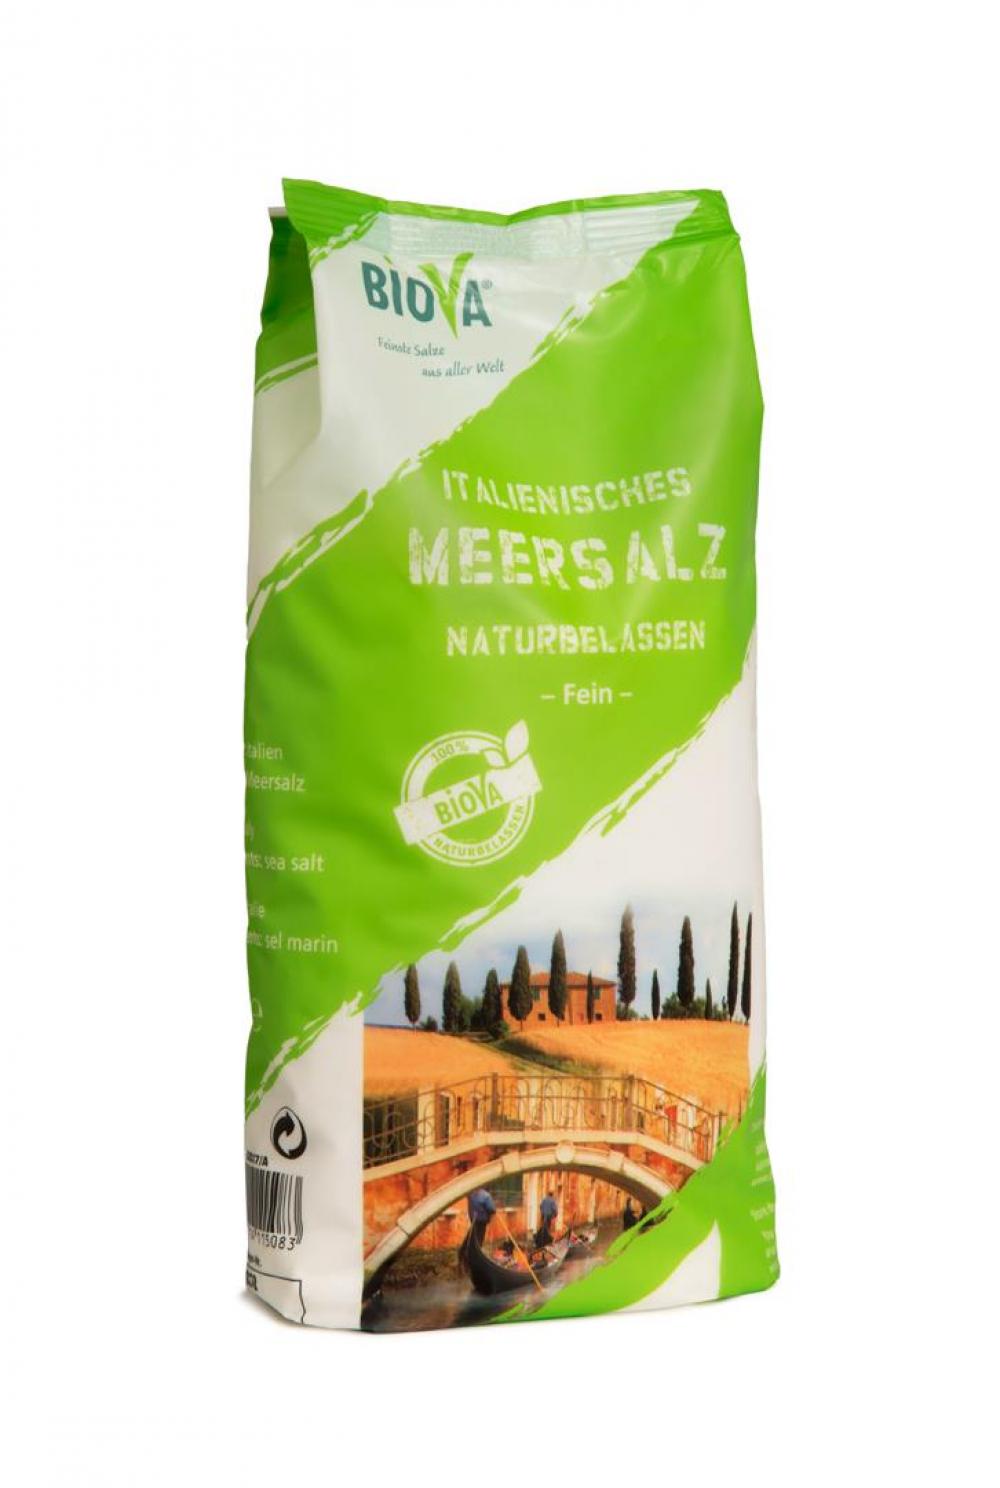 Biova Gourmetsalz Mittelmeer Meersalz Naturbelassen Fein 0,2-1,0mm 1000g Beutel